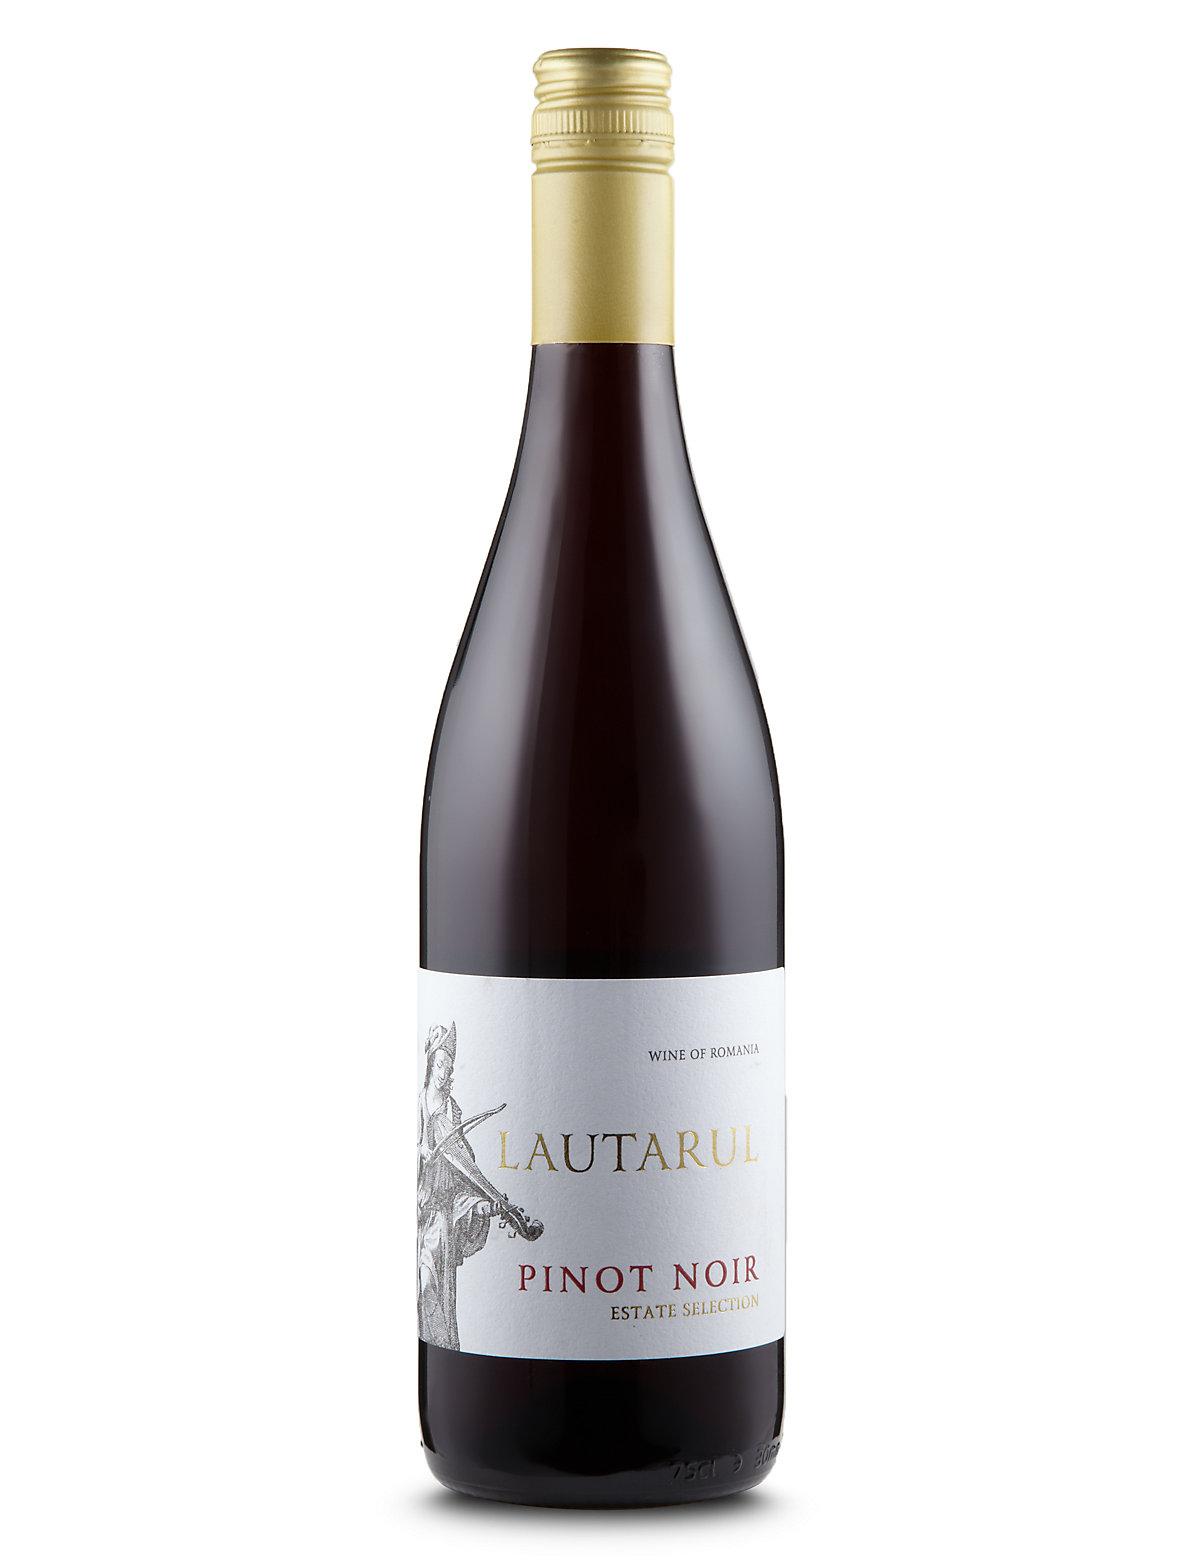 Lautarul Pinot Noir Case of 6